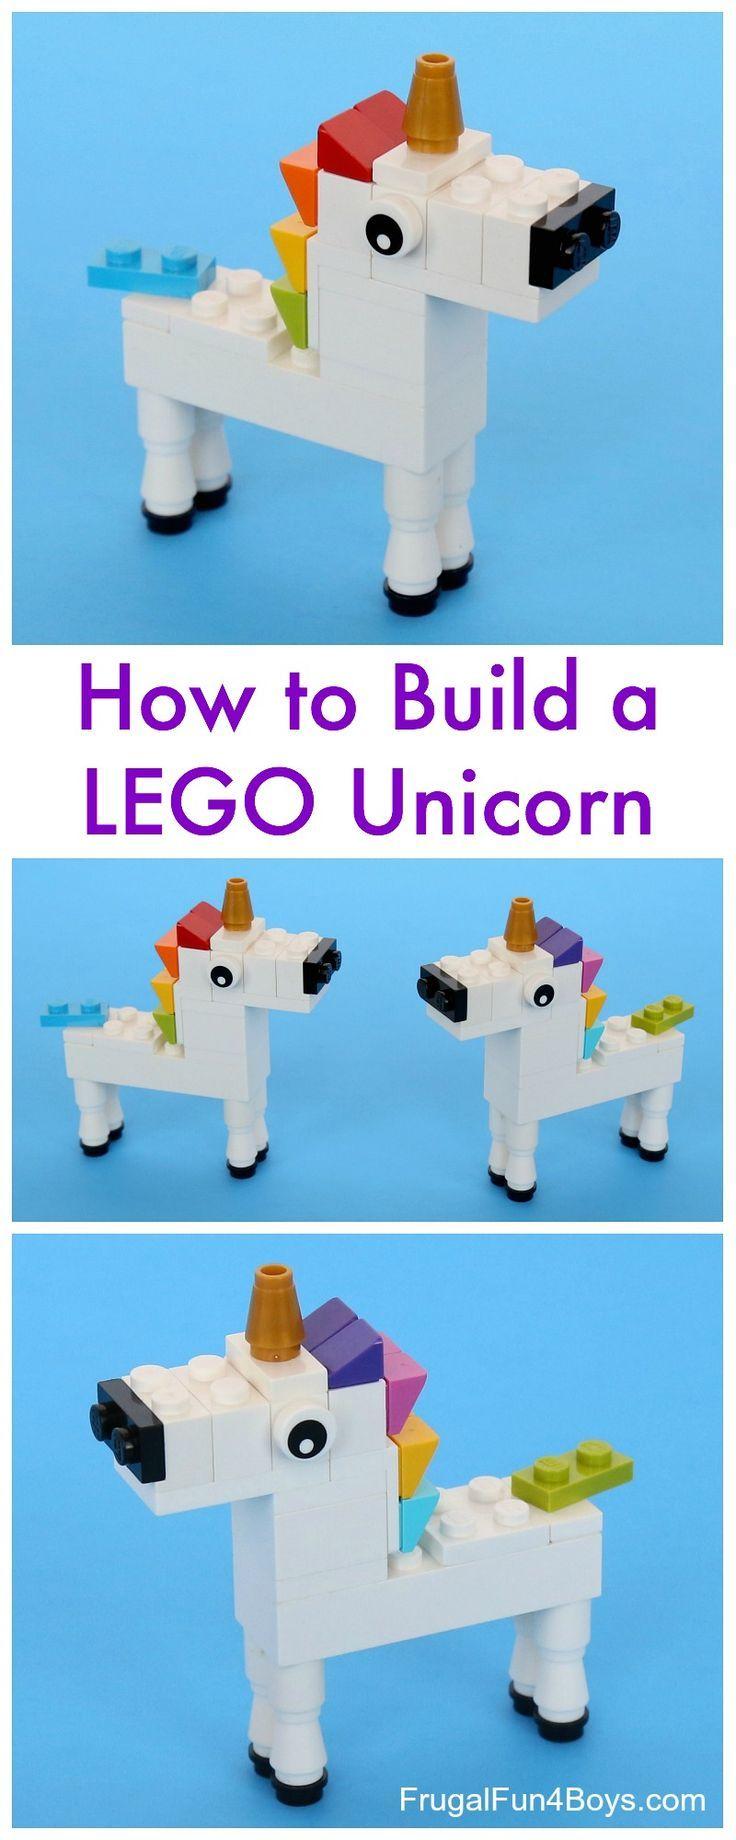 Lego Unicorn Building Instructions Barna S Kzmves